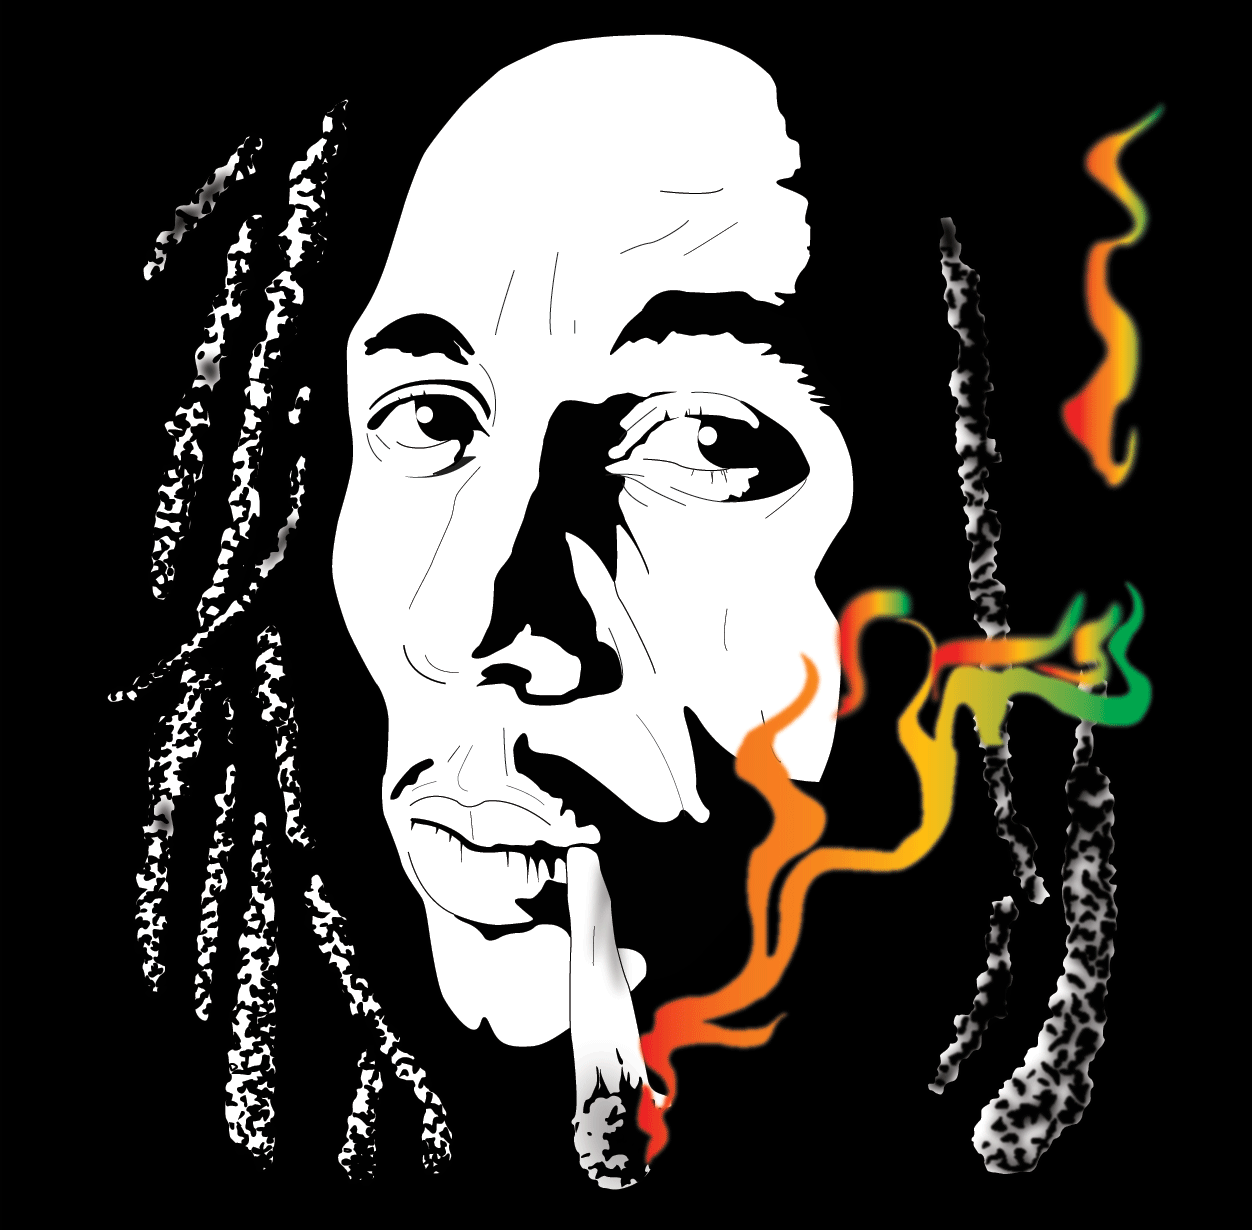 Bob Marley Images And Graphics